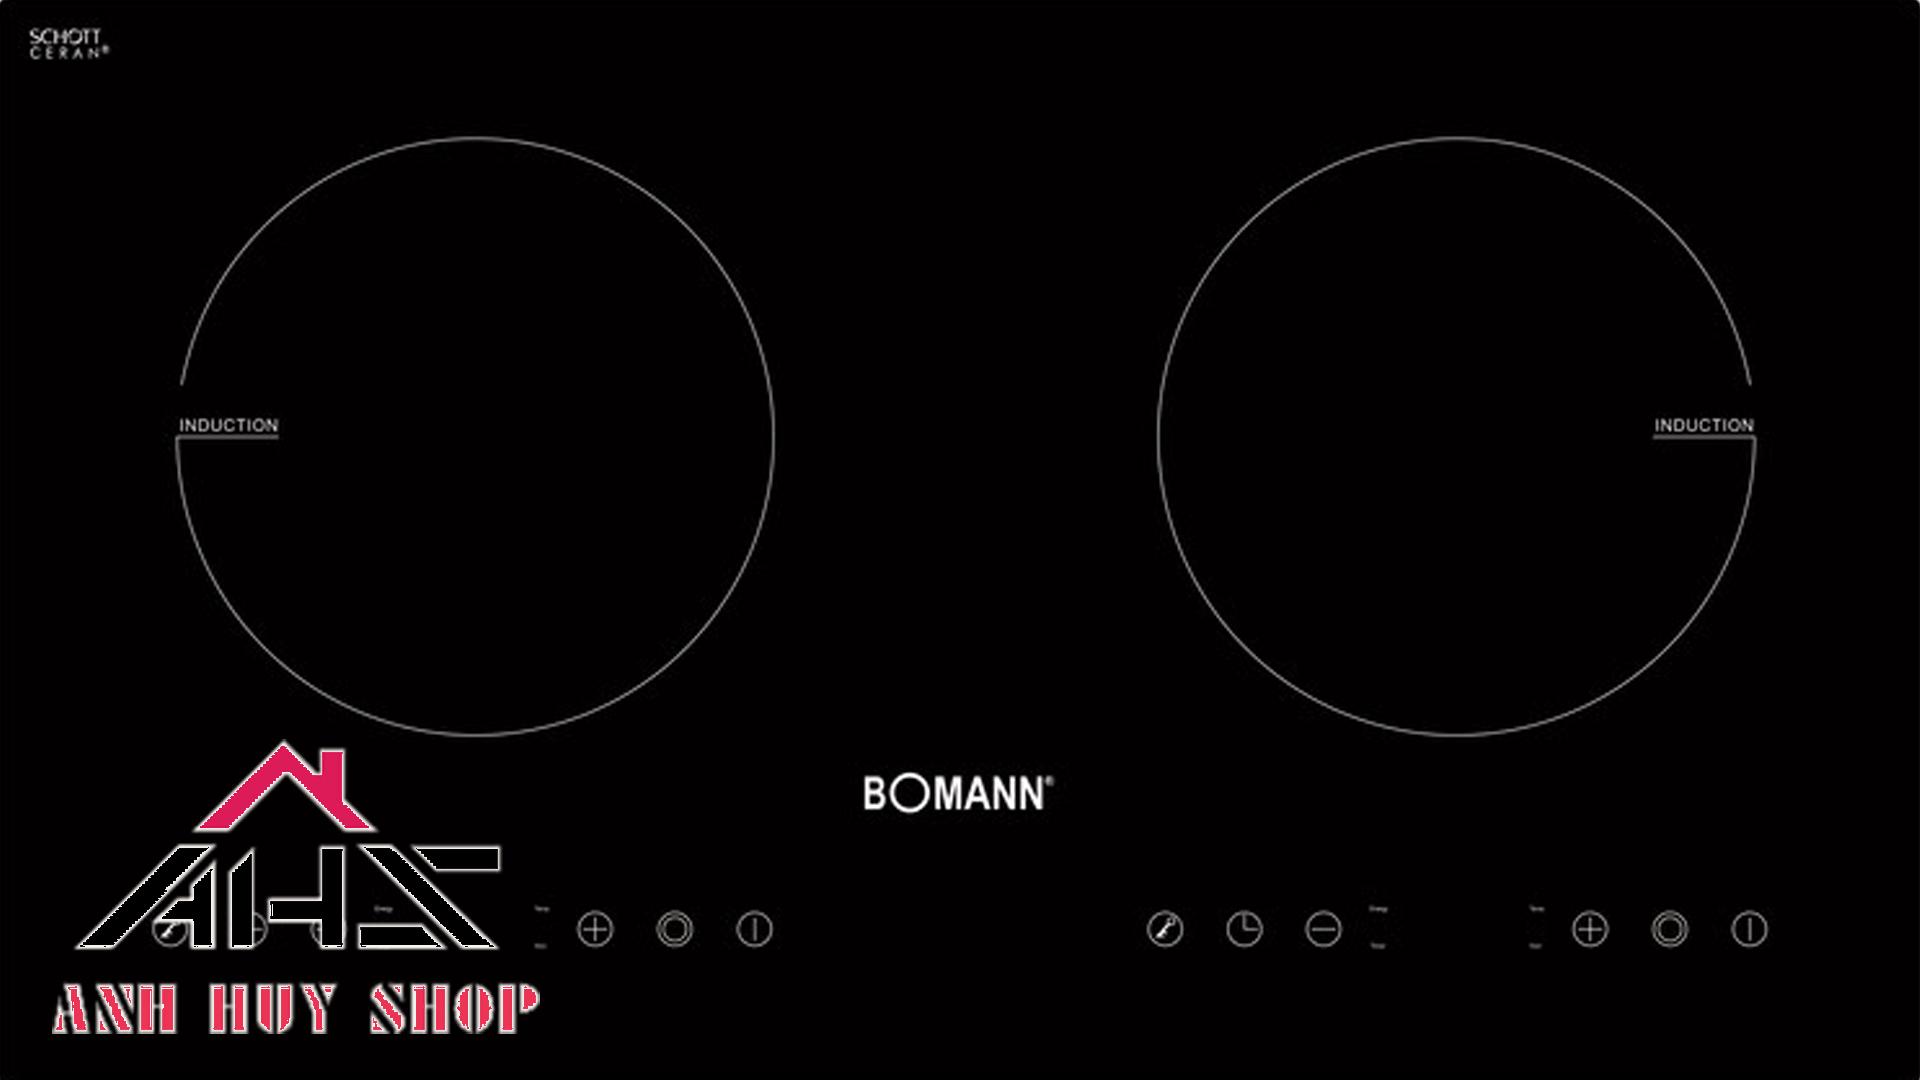 bep-tu-bomann-ebk-dt-05d